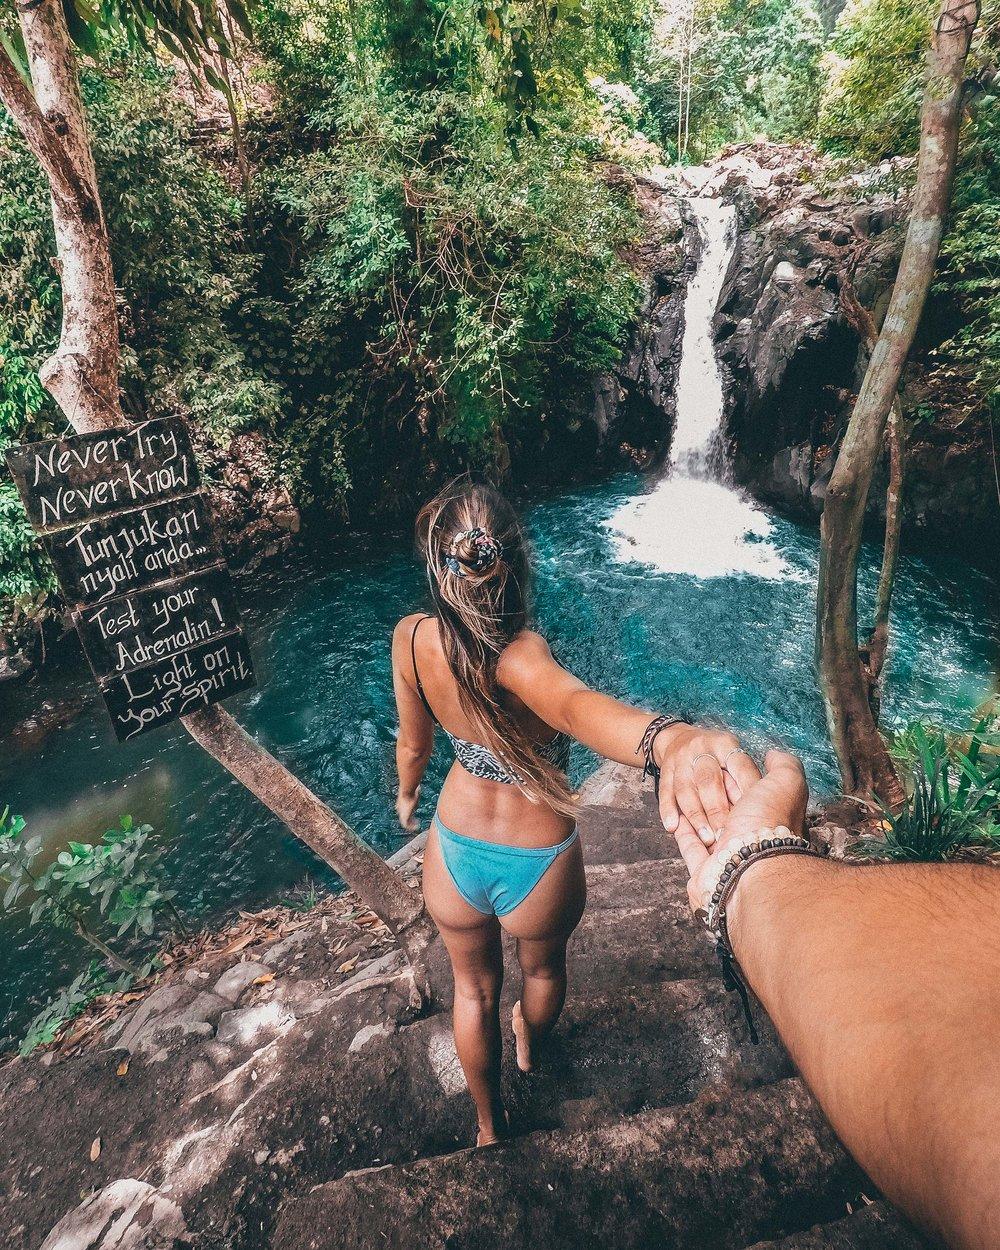 aling aling waterfall munduk wild nature explore travel gopro